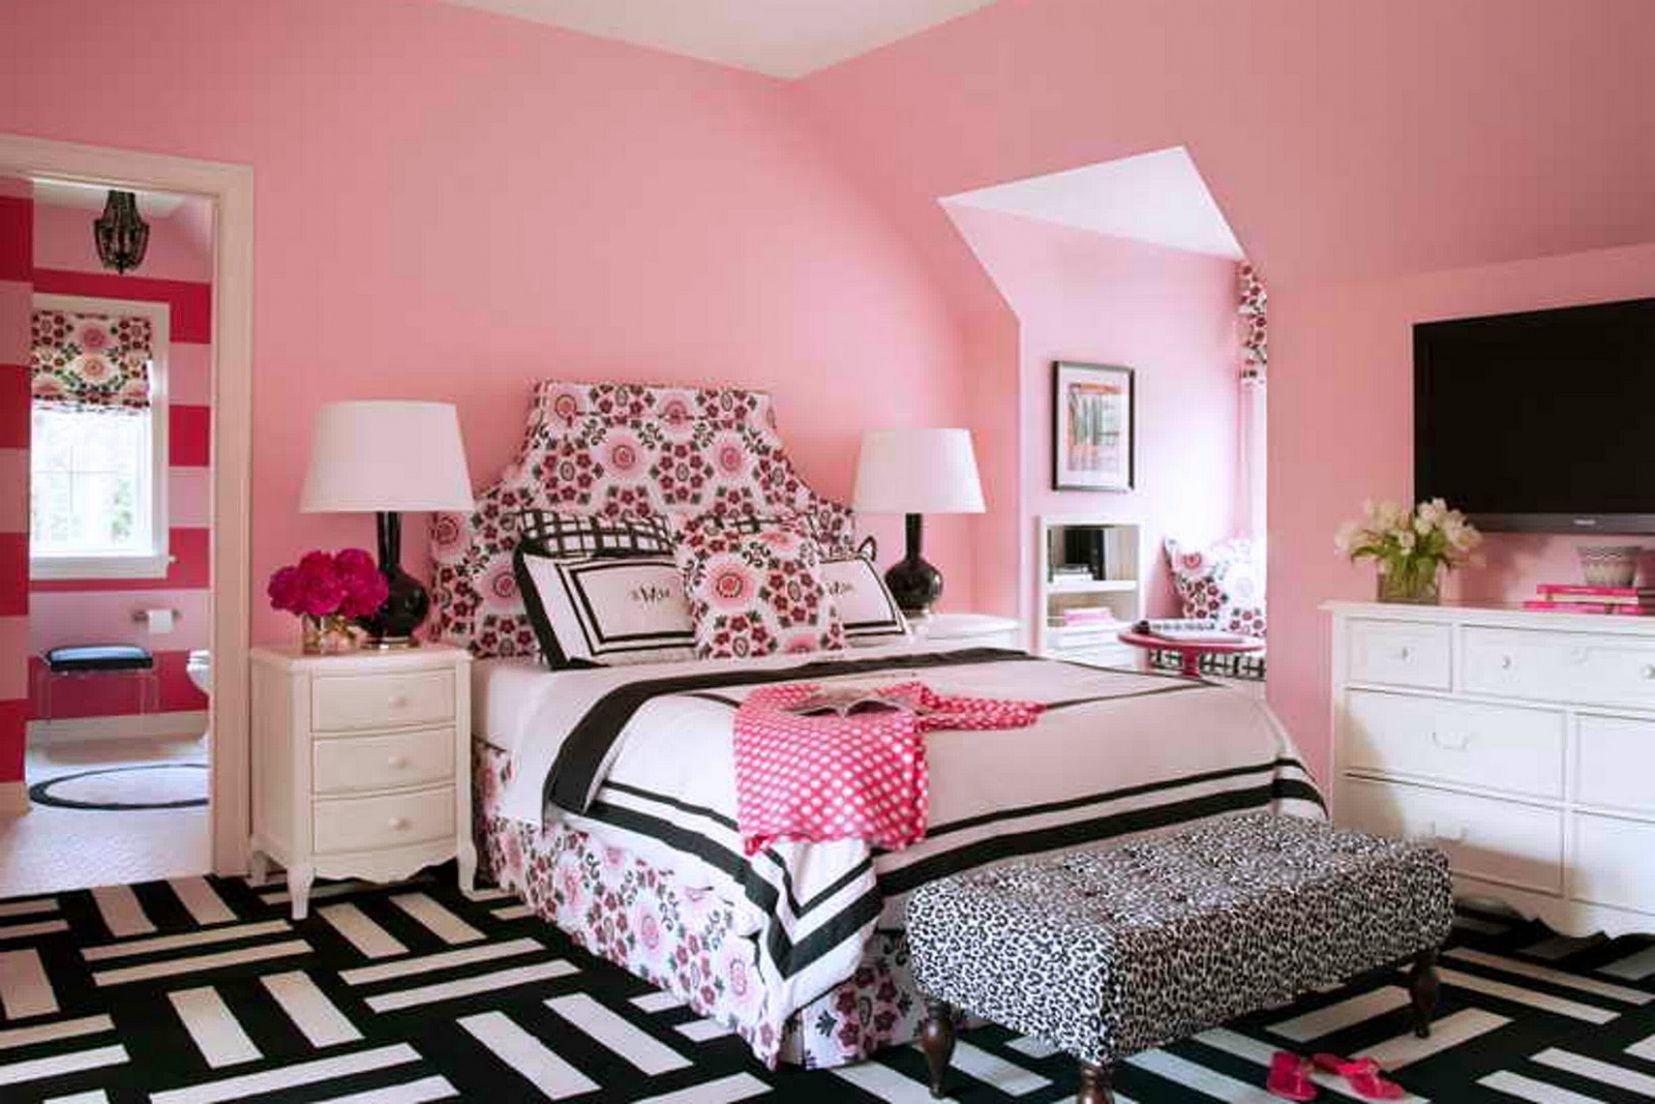 Master bedroom furniture ideas   Room for Teenage Girl  Master Bedroom Furniture Ideas Check